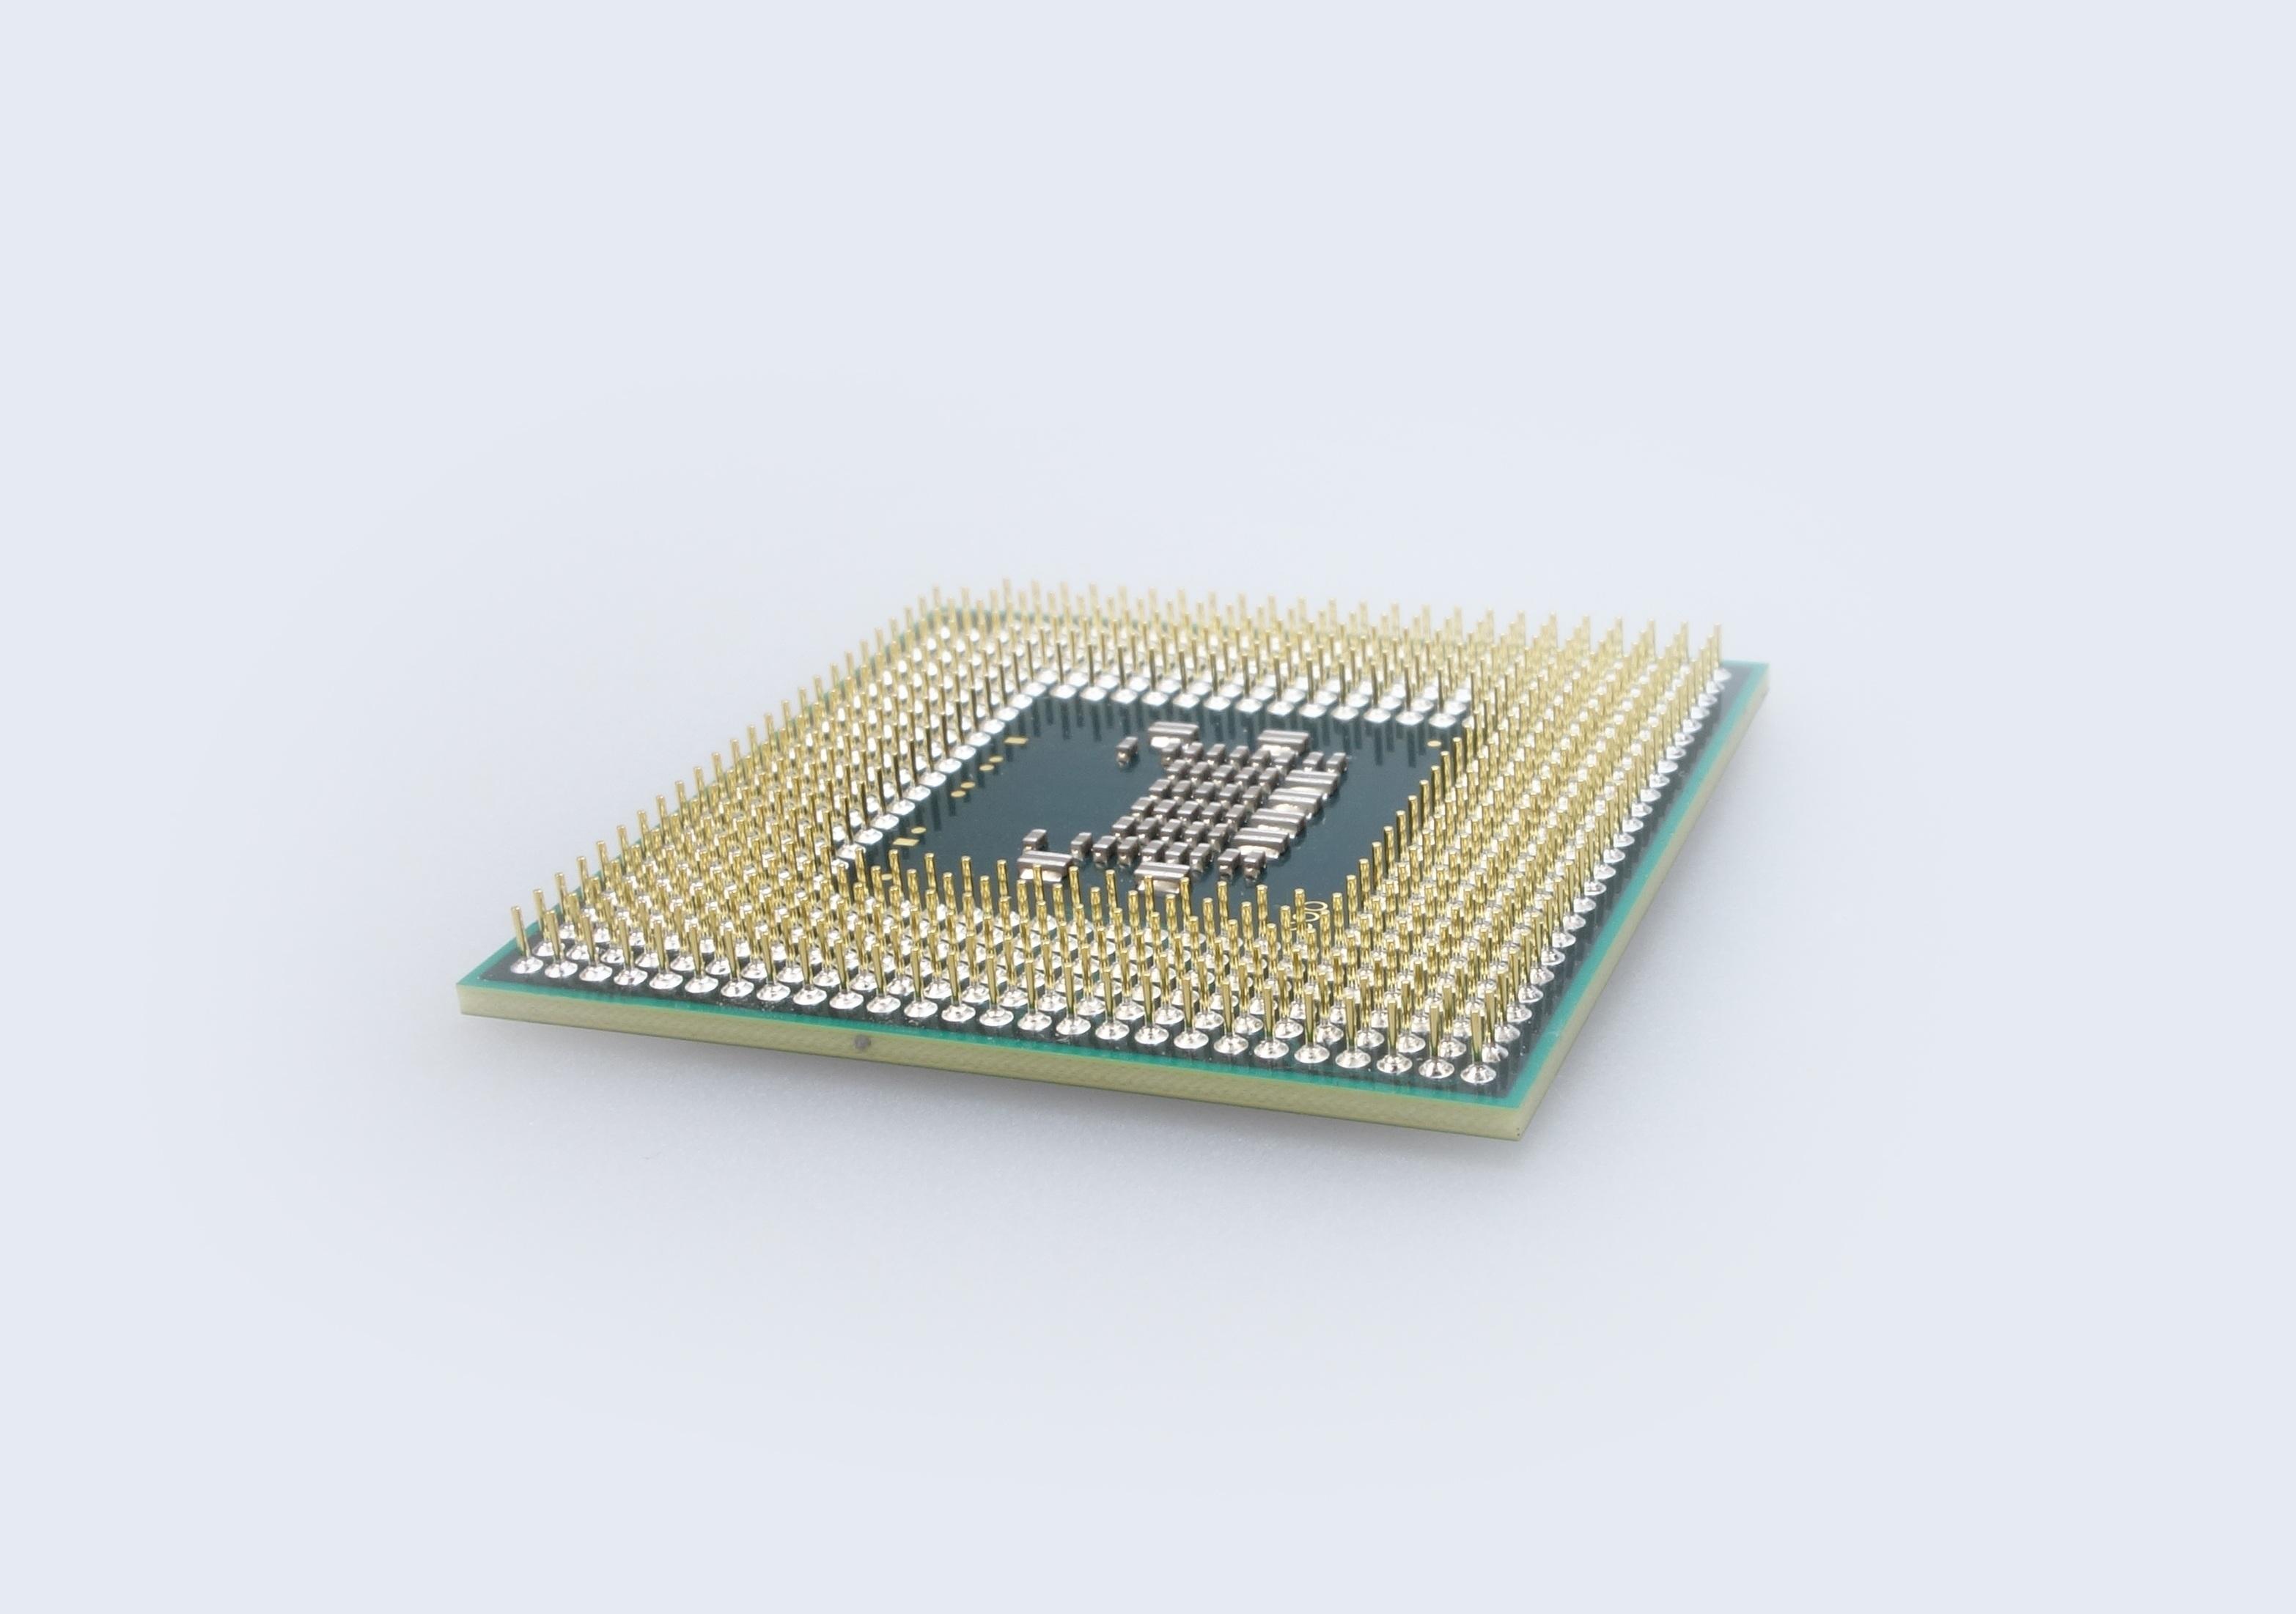 procesor, komputer, informatyka, tranzystor